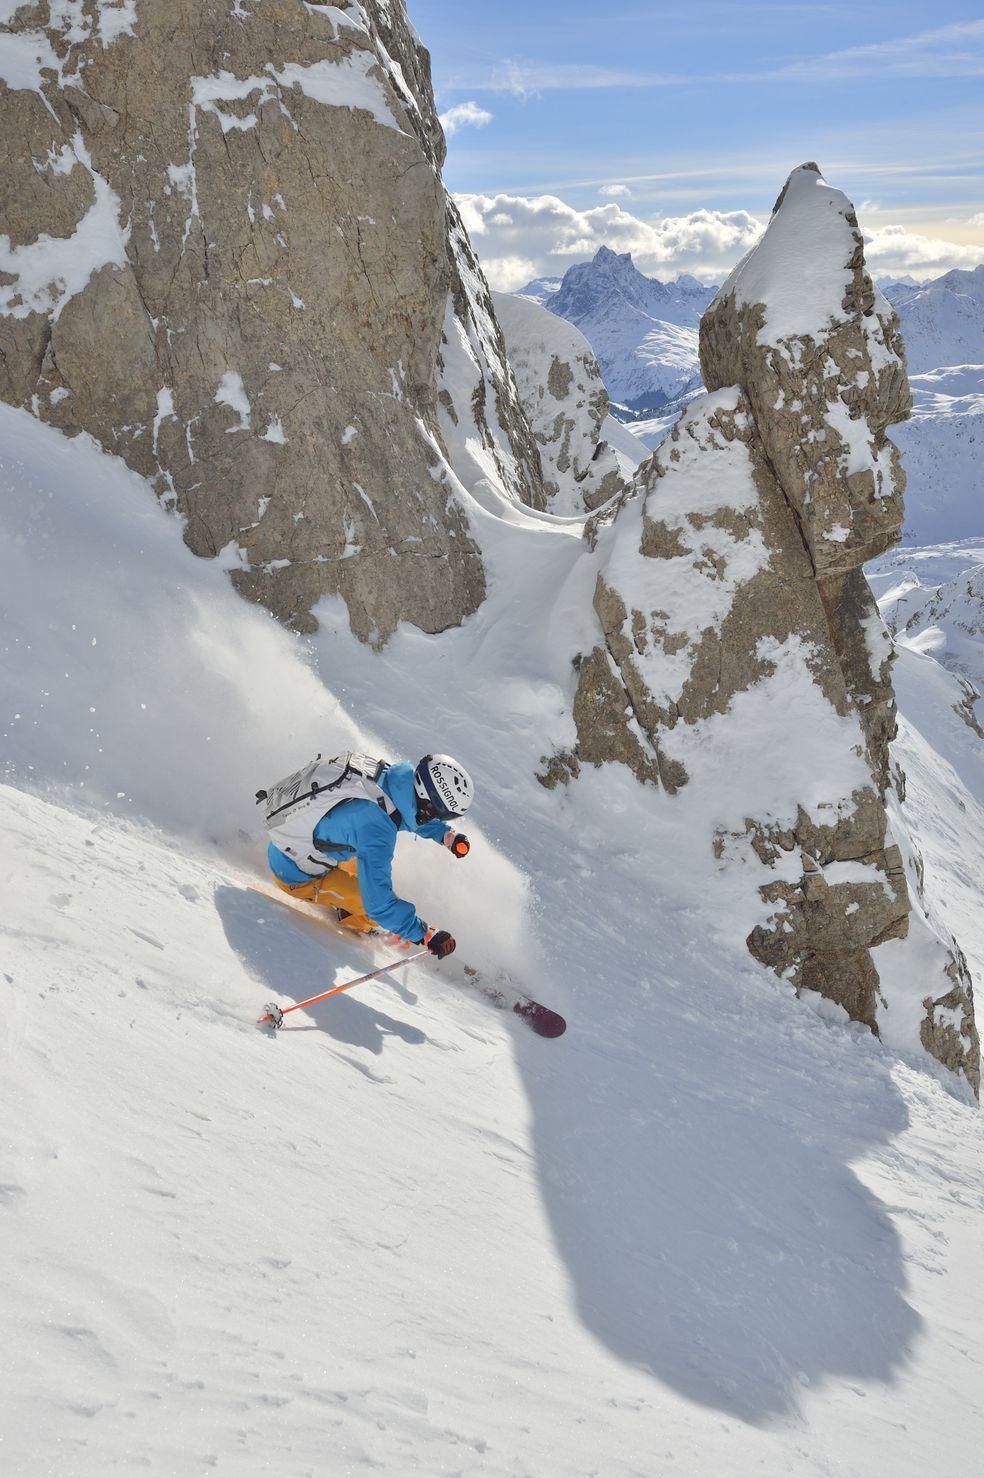 Freeride ski - freeskiing in St. Anton am Arlberg, Austria